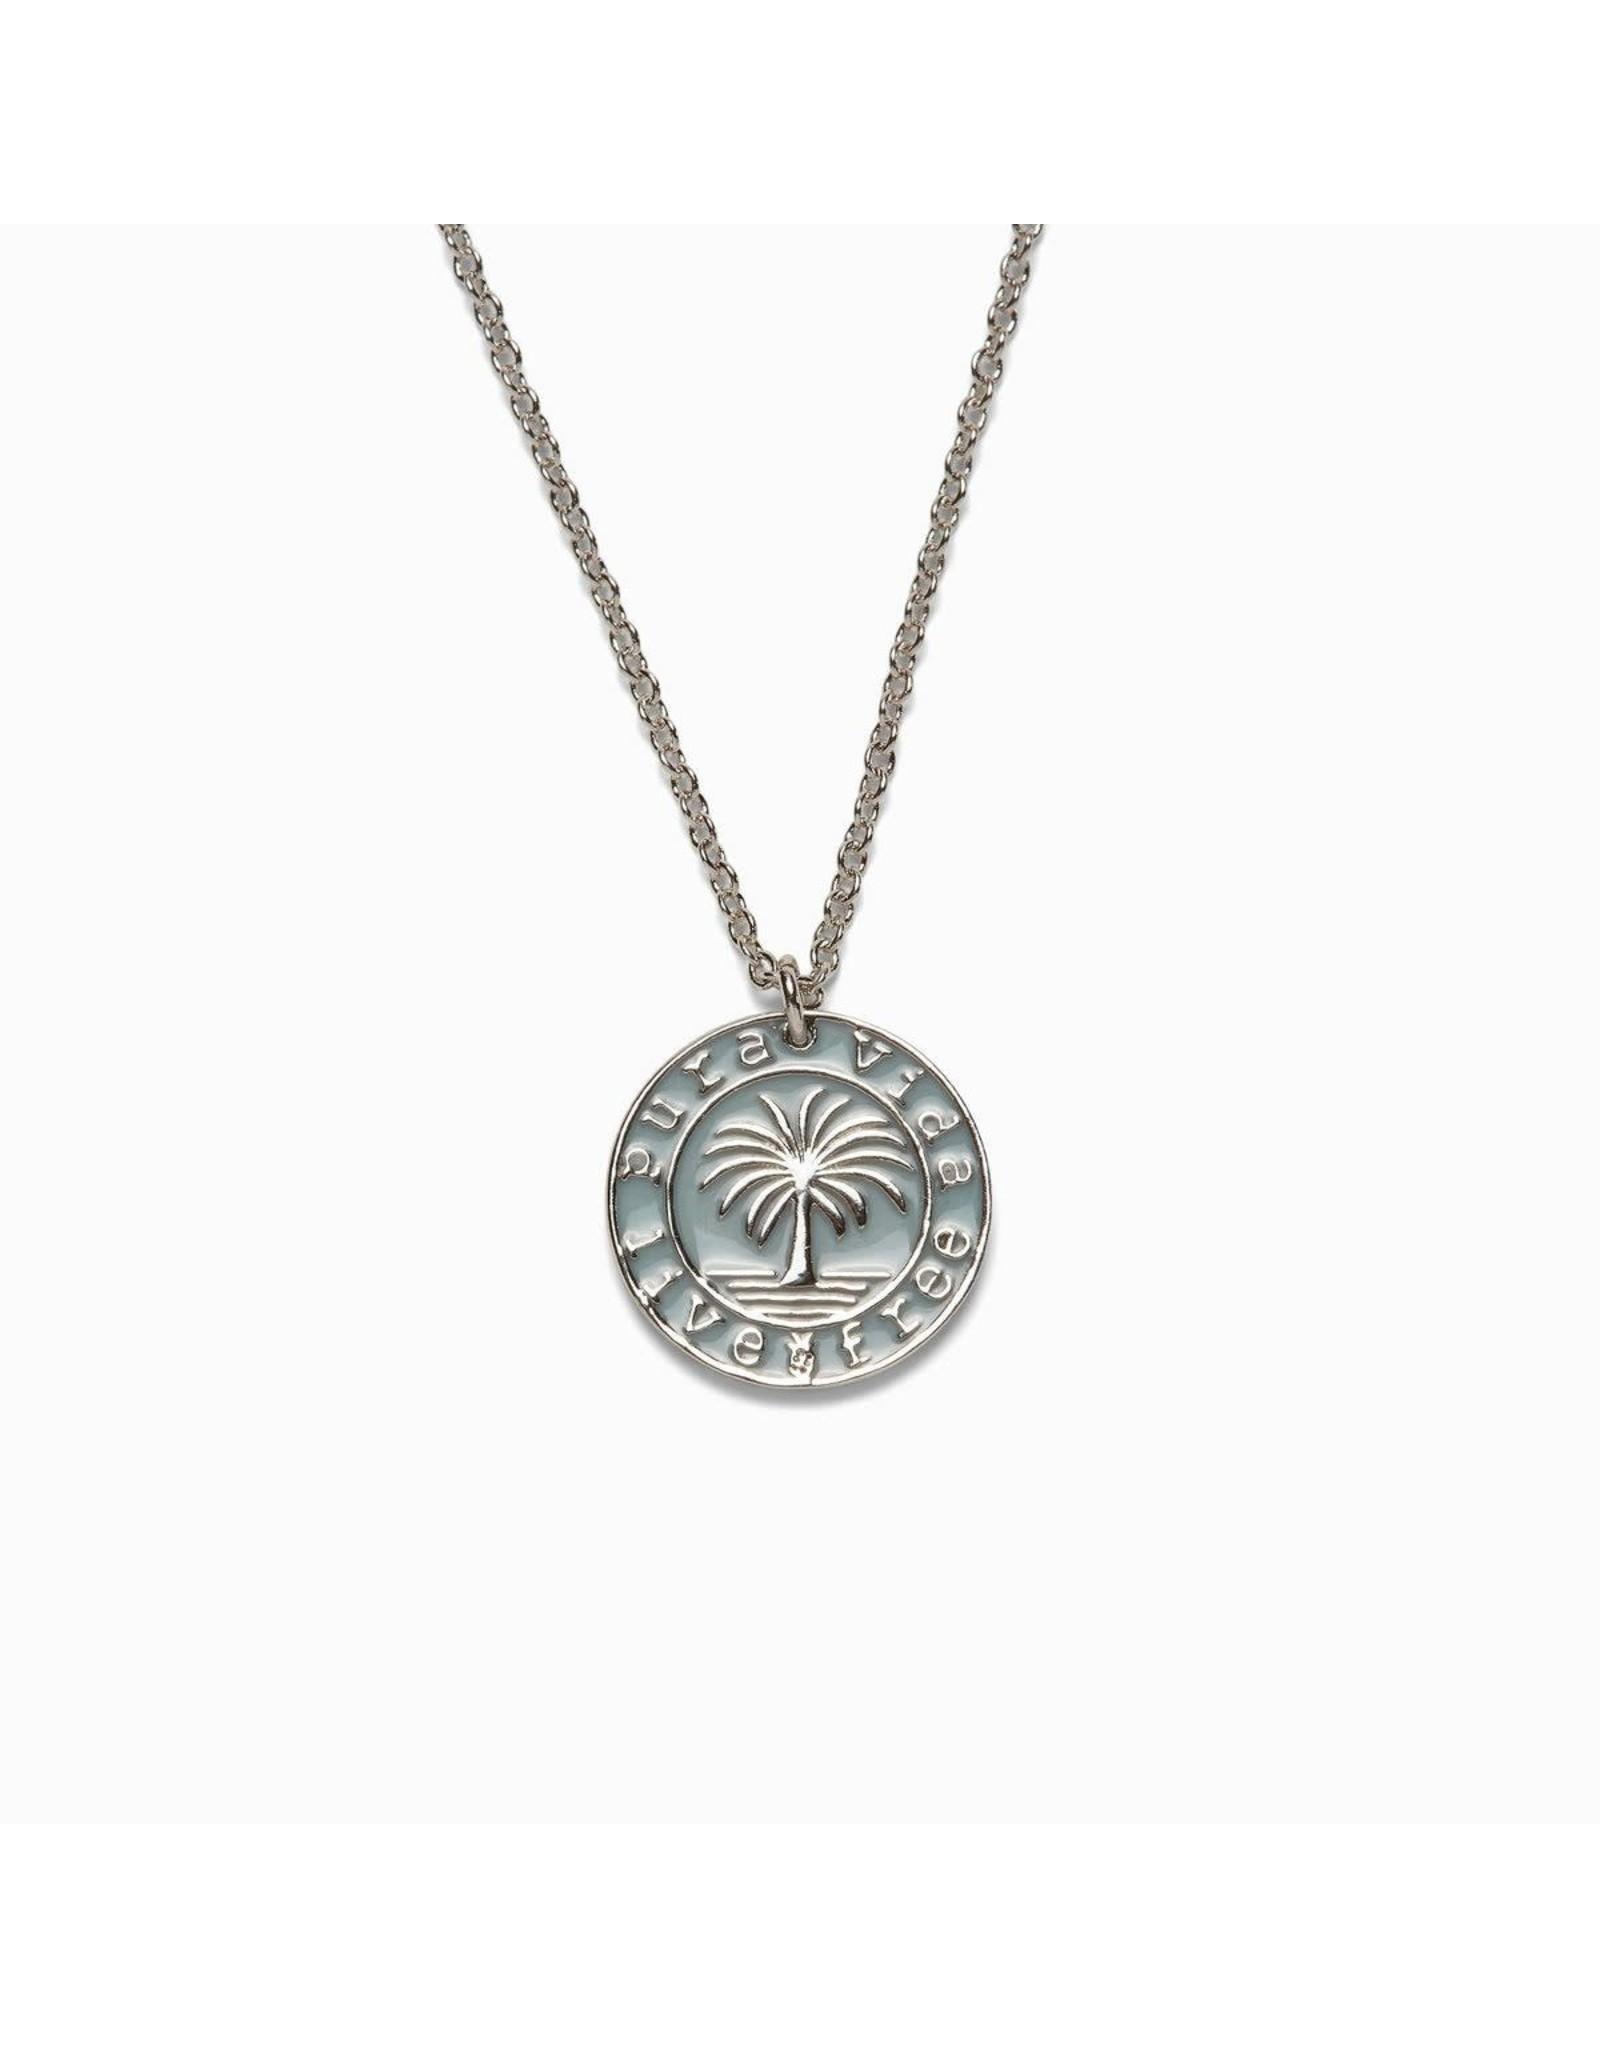 Pura Vida Pura Vida Medallion Necklace, Silver